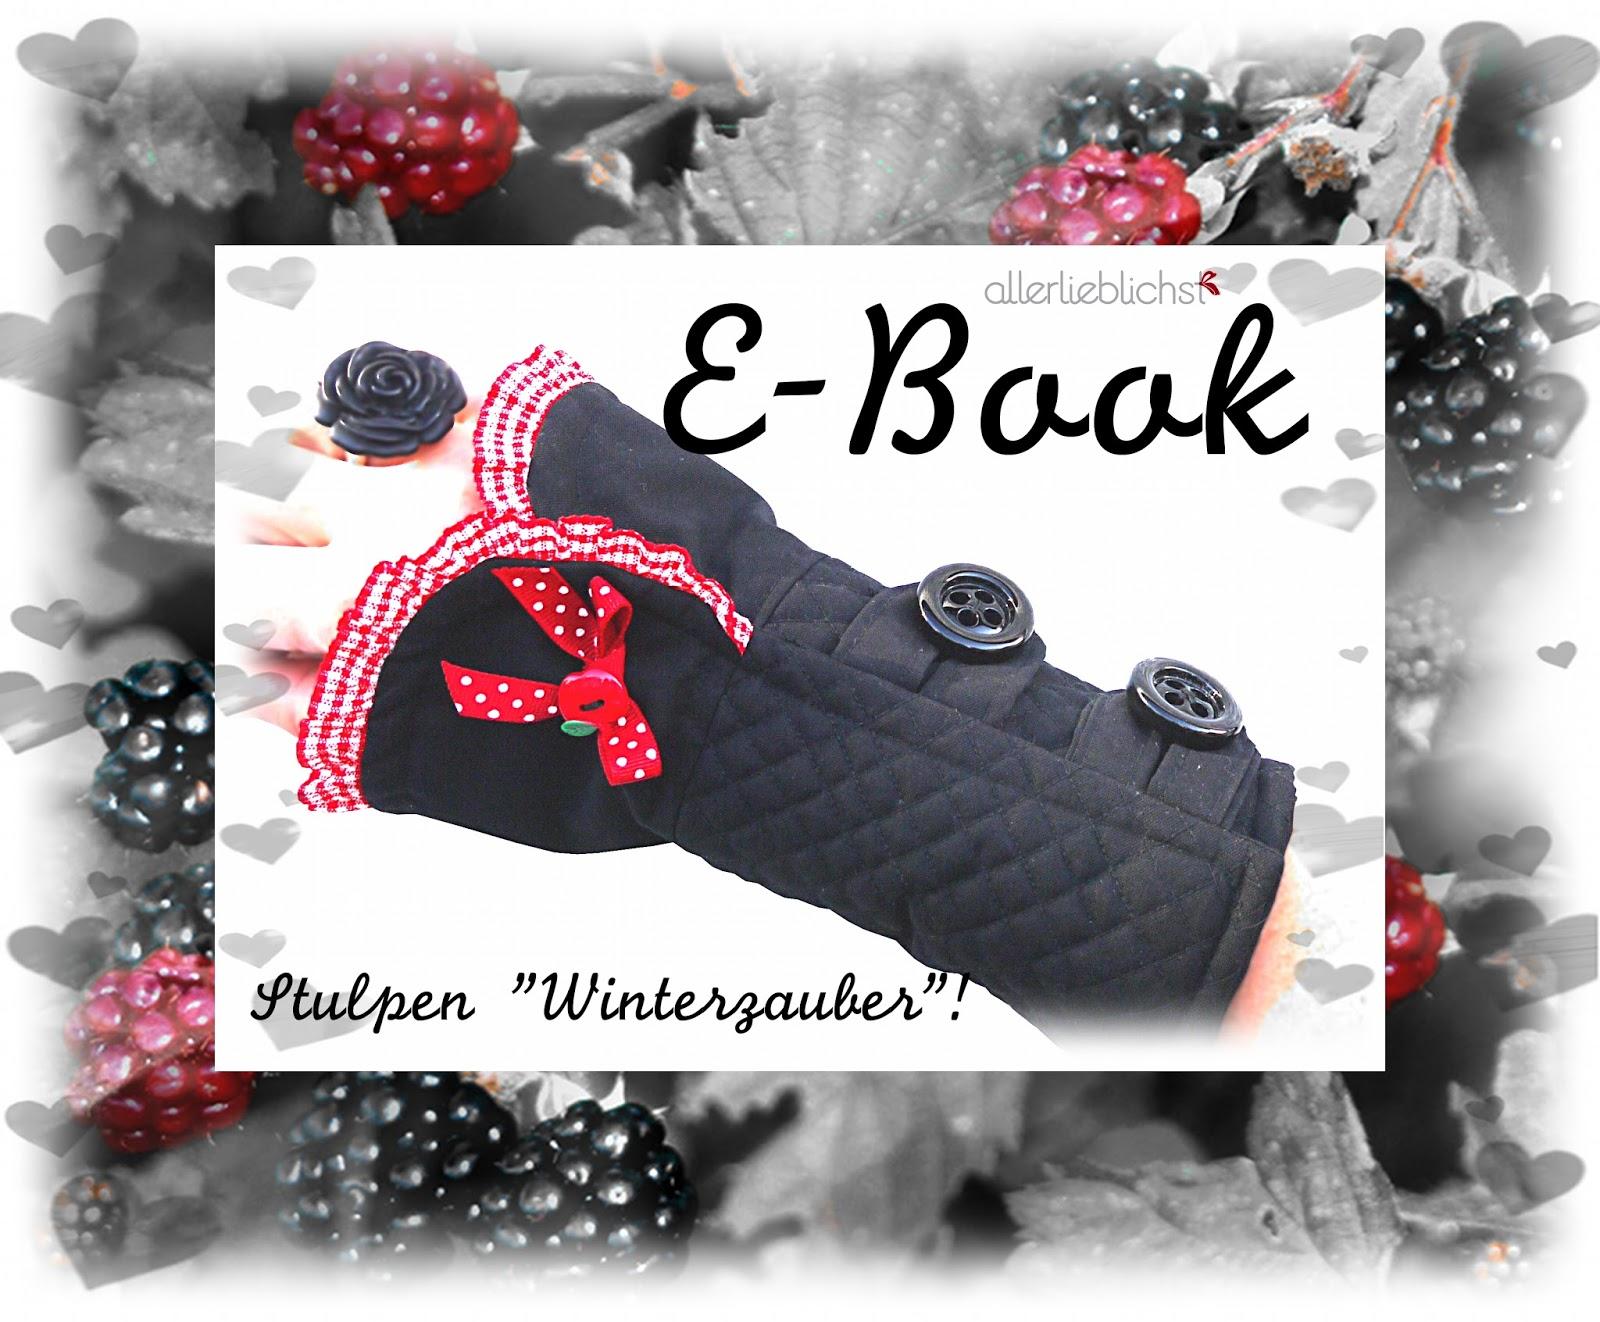 E-Book Stulpen Winterzauber